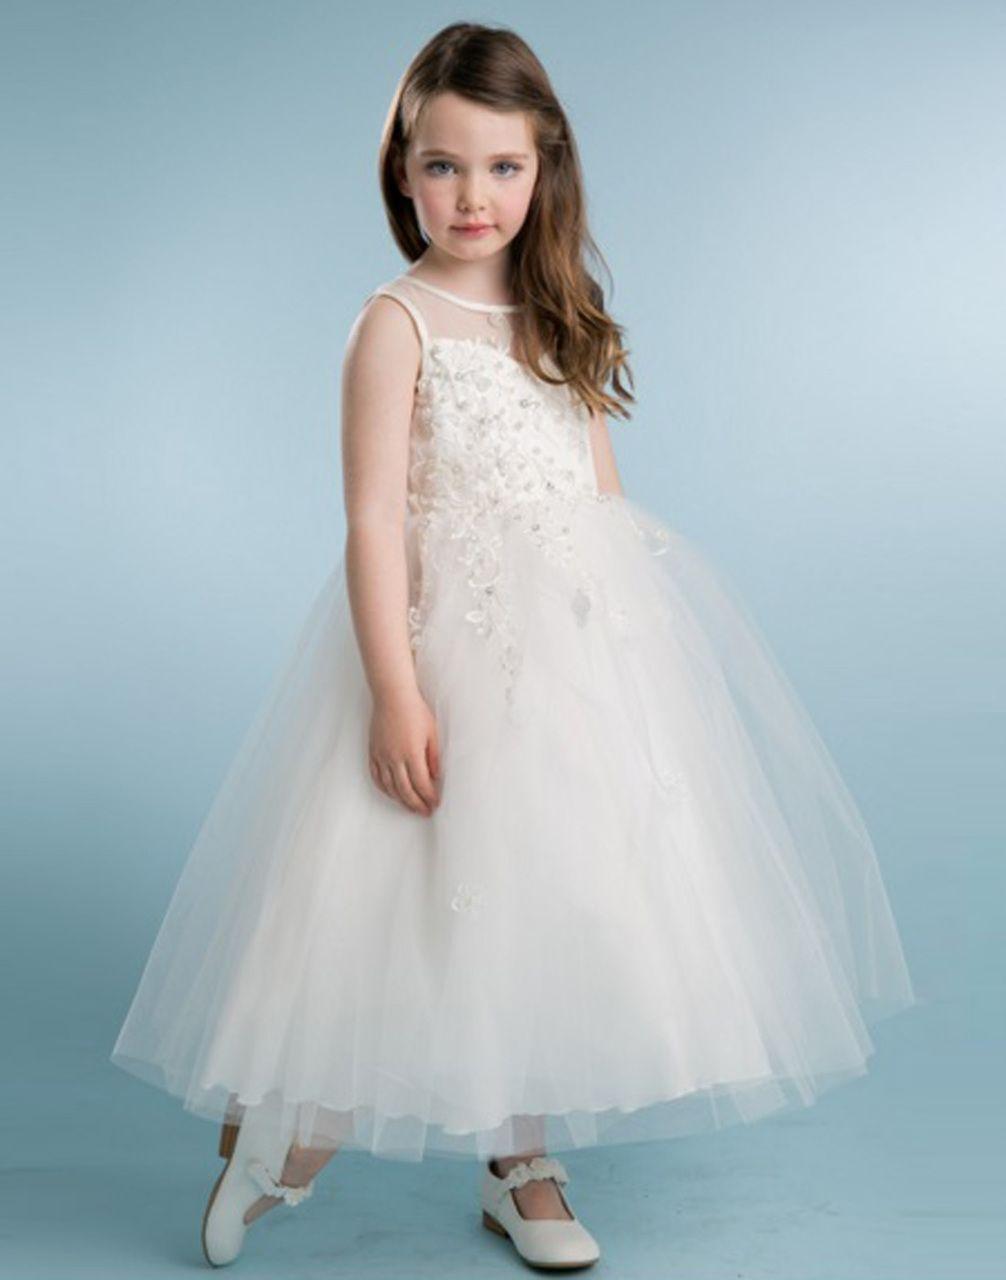 Dazzling ivory floral beaded tulle flower girl dress